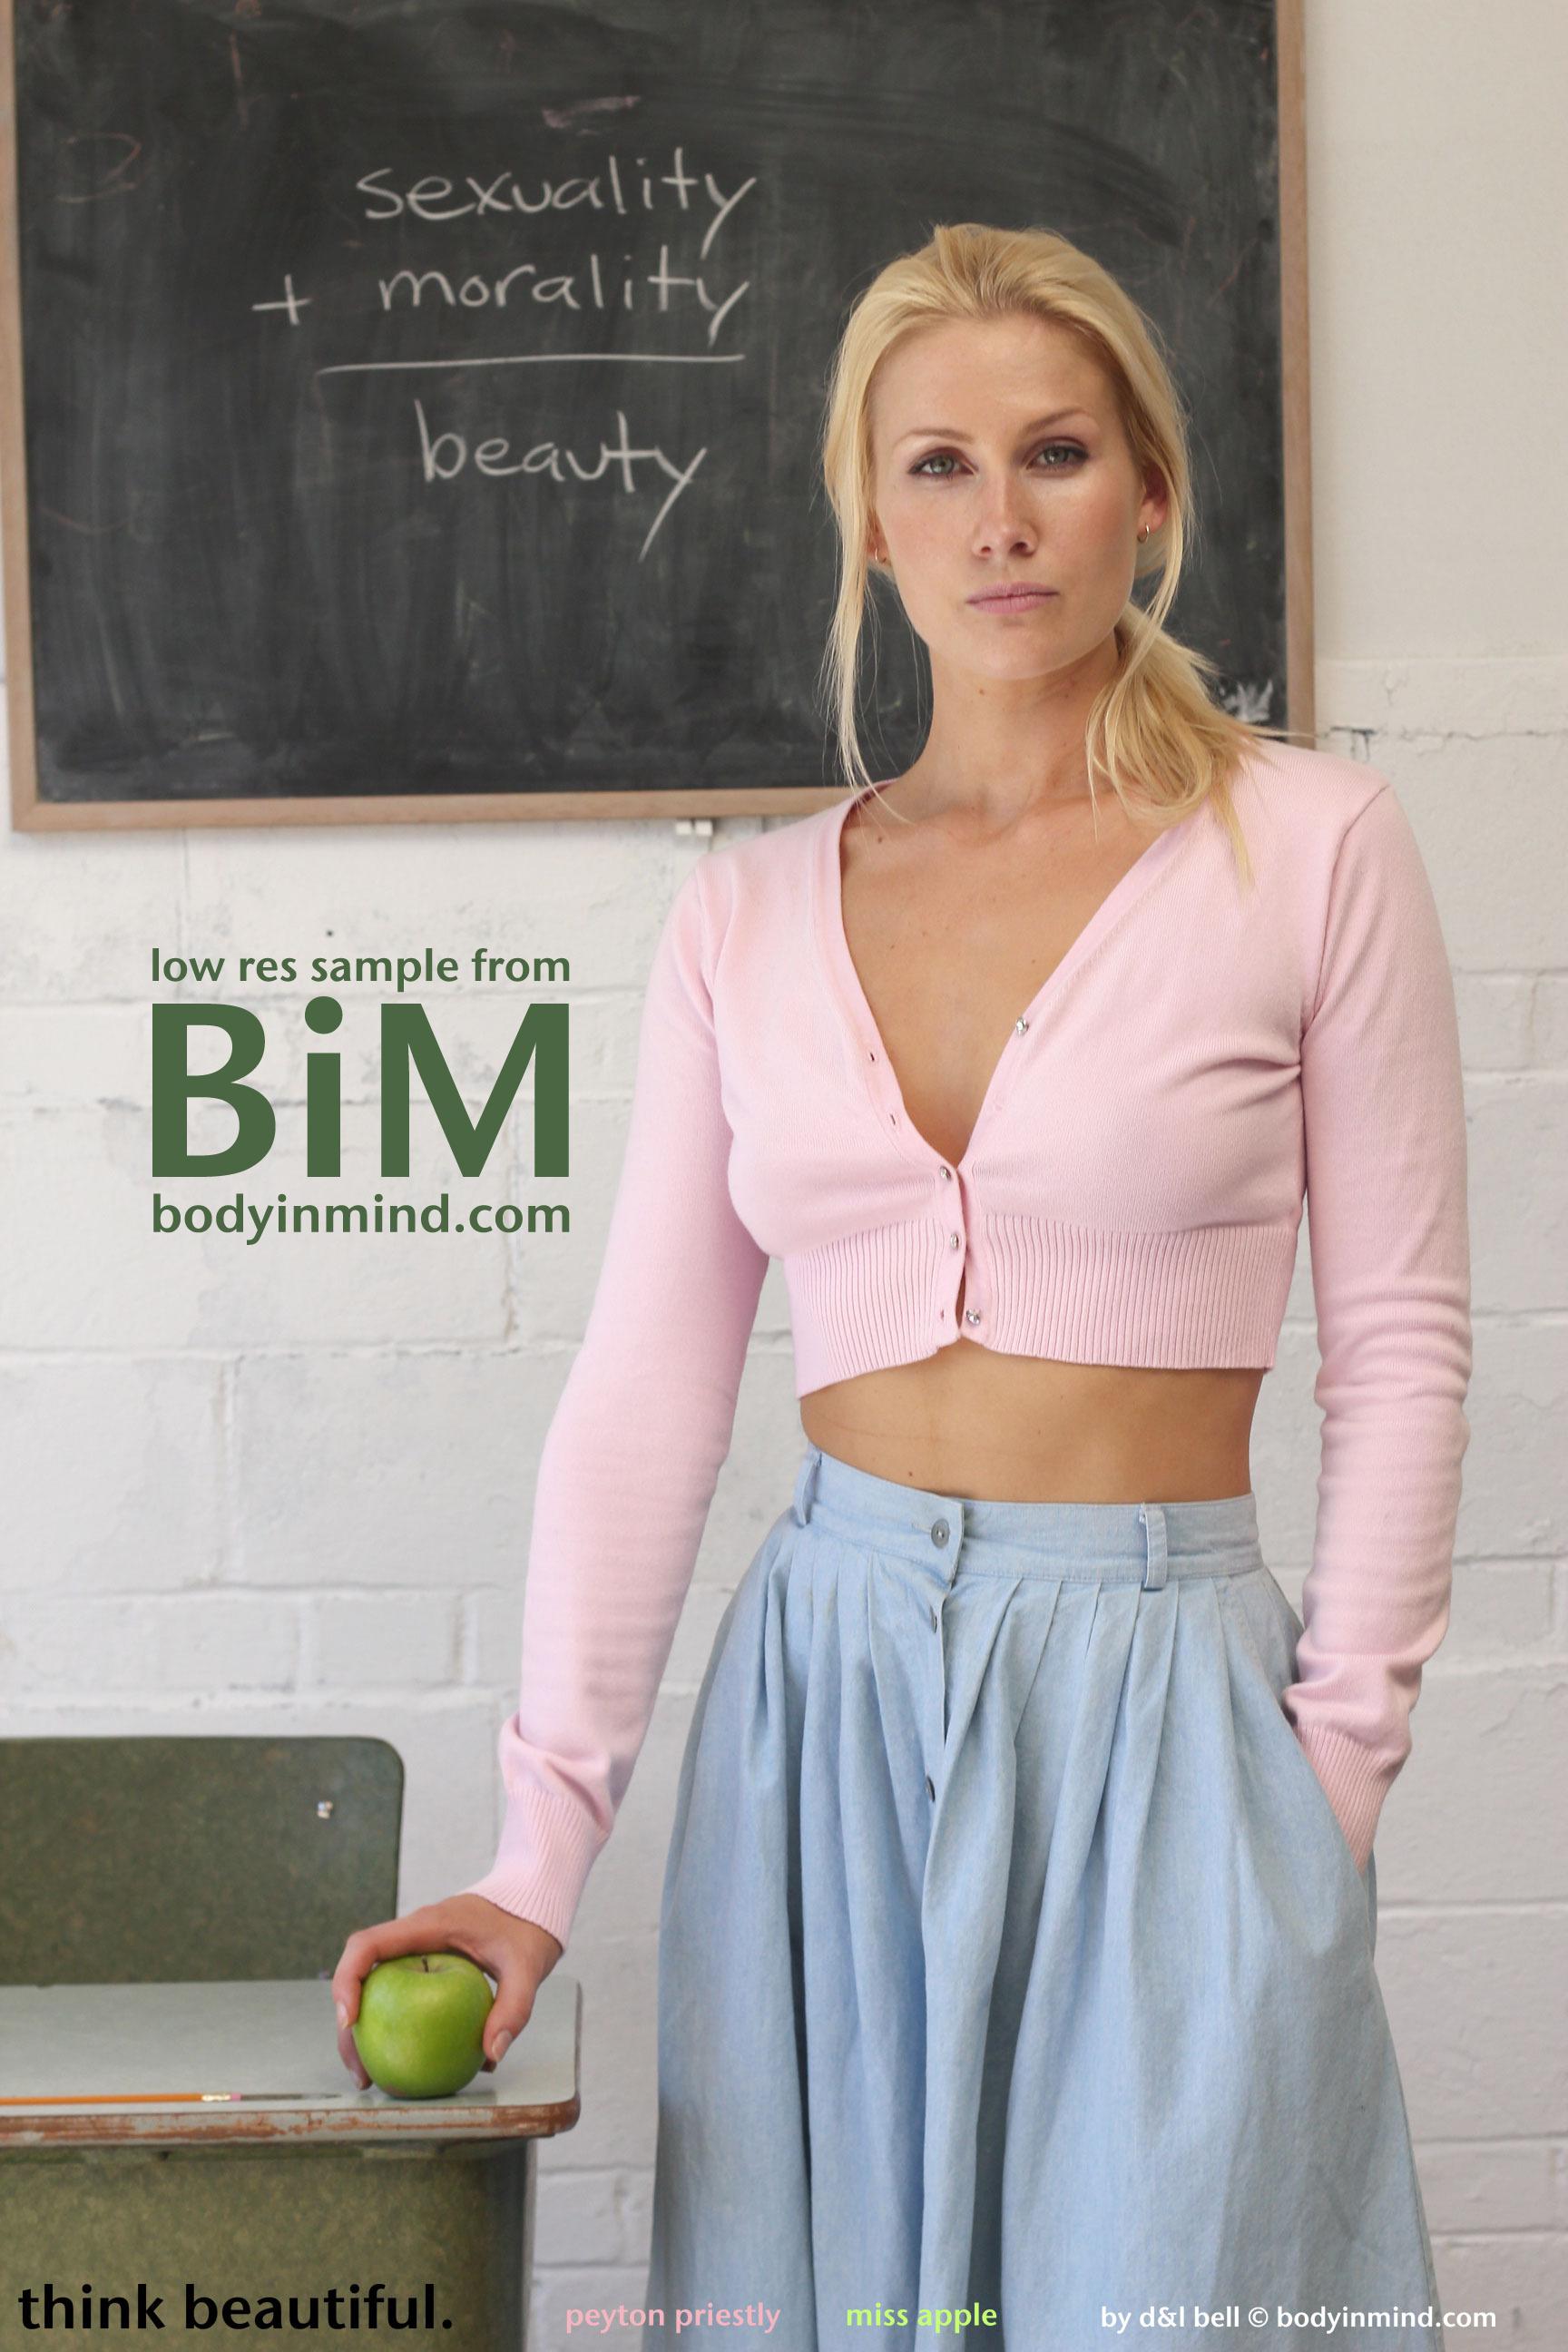 hip-women-nudes-beautiful-teacher-pack-pussy